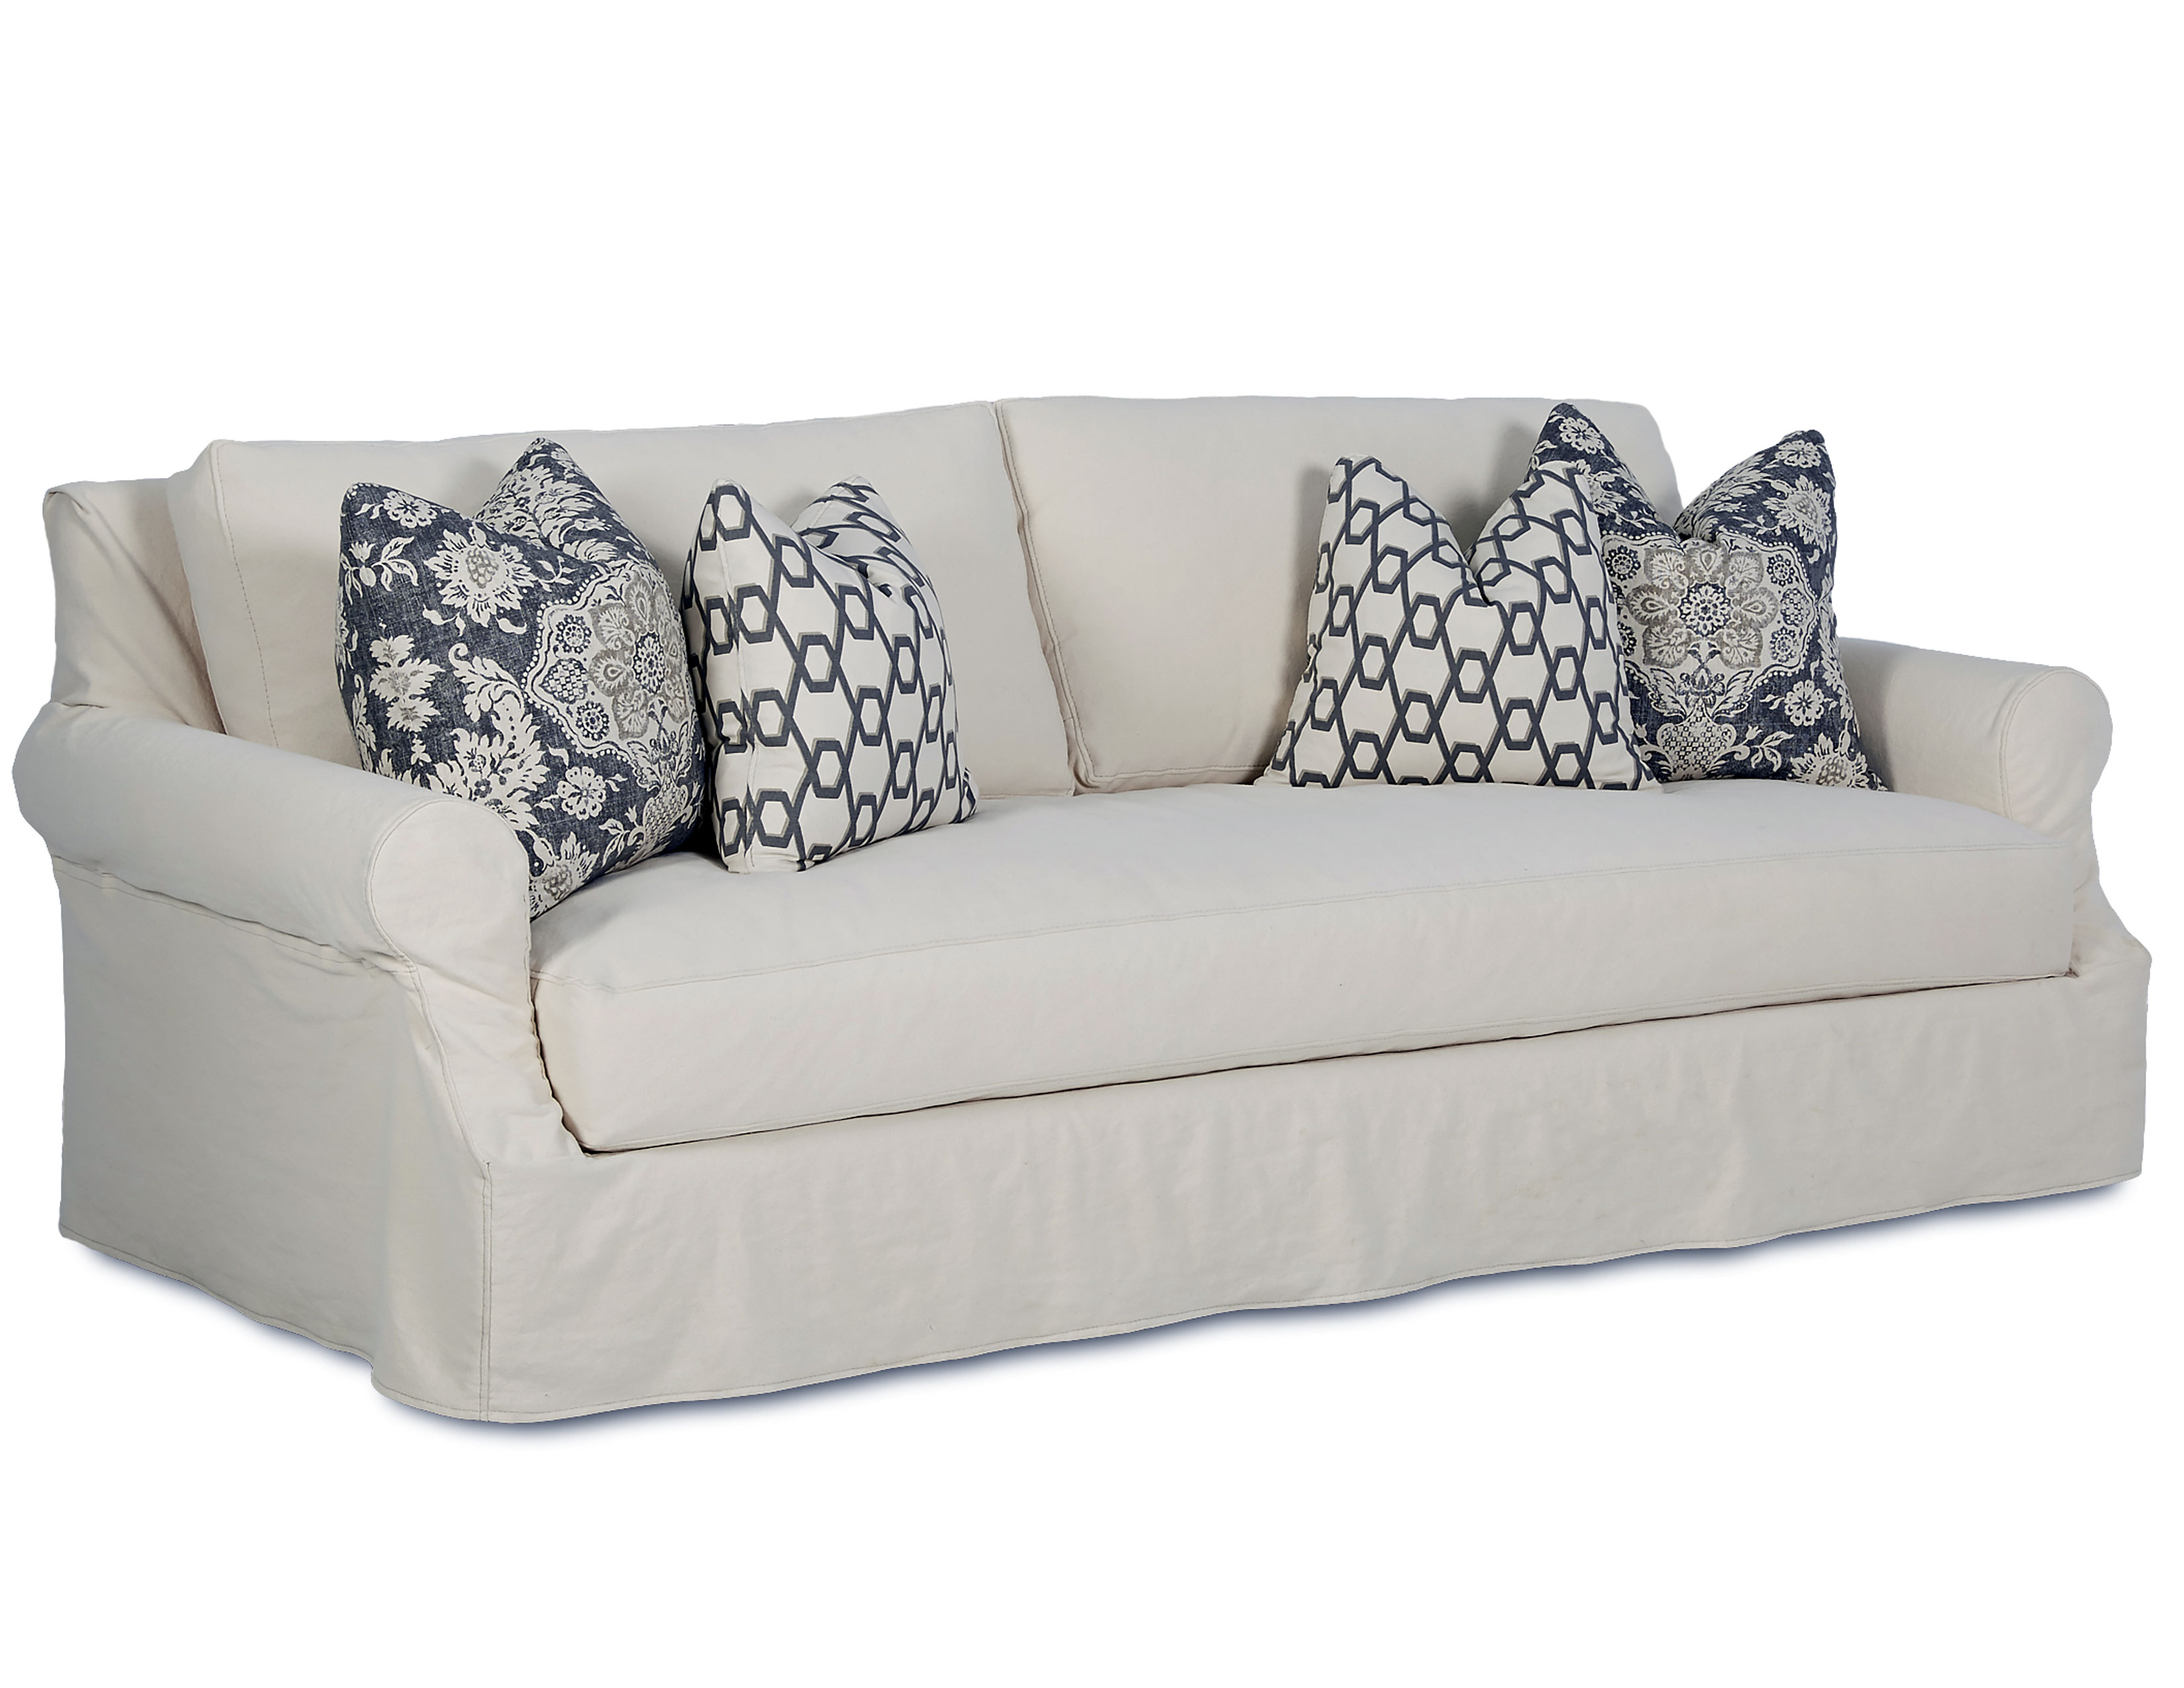 Amazing Barrett 90 Slipcover Sofa With Down Sofas And Sectionals Creativecarmelina Interior Chair Design Creativecarmelinacom